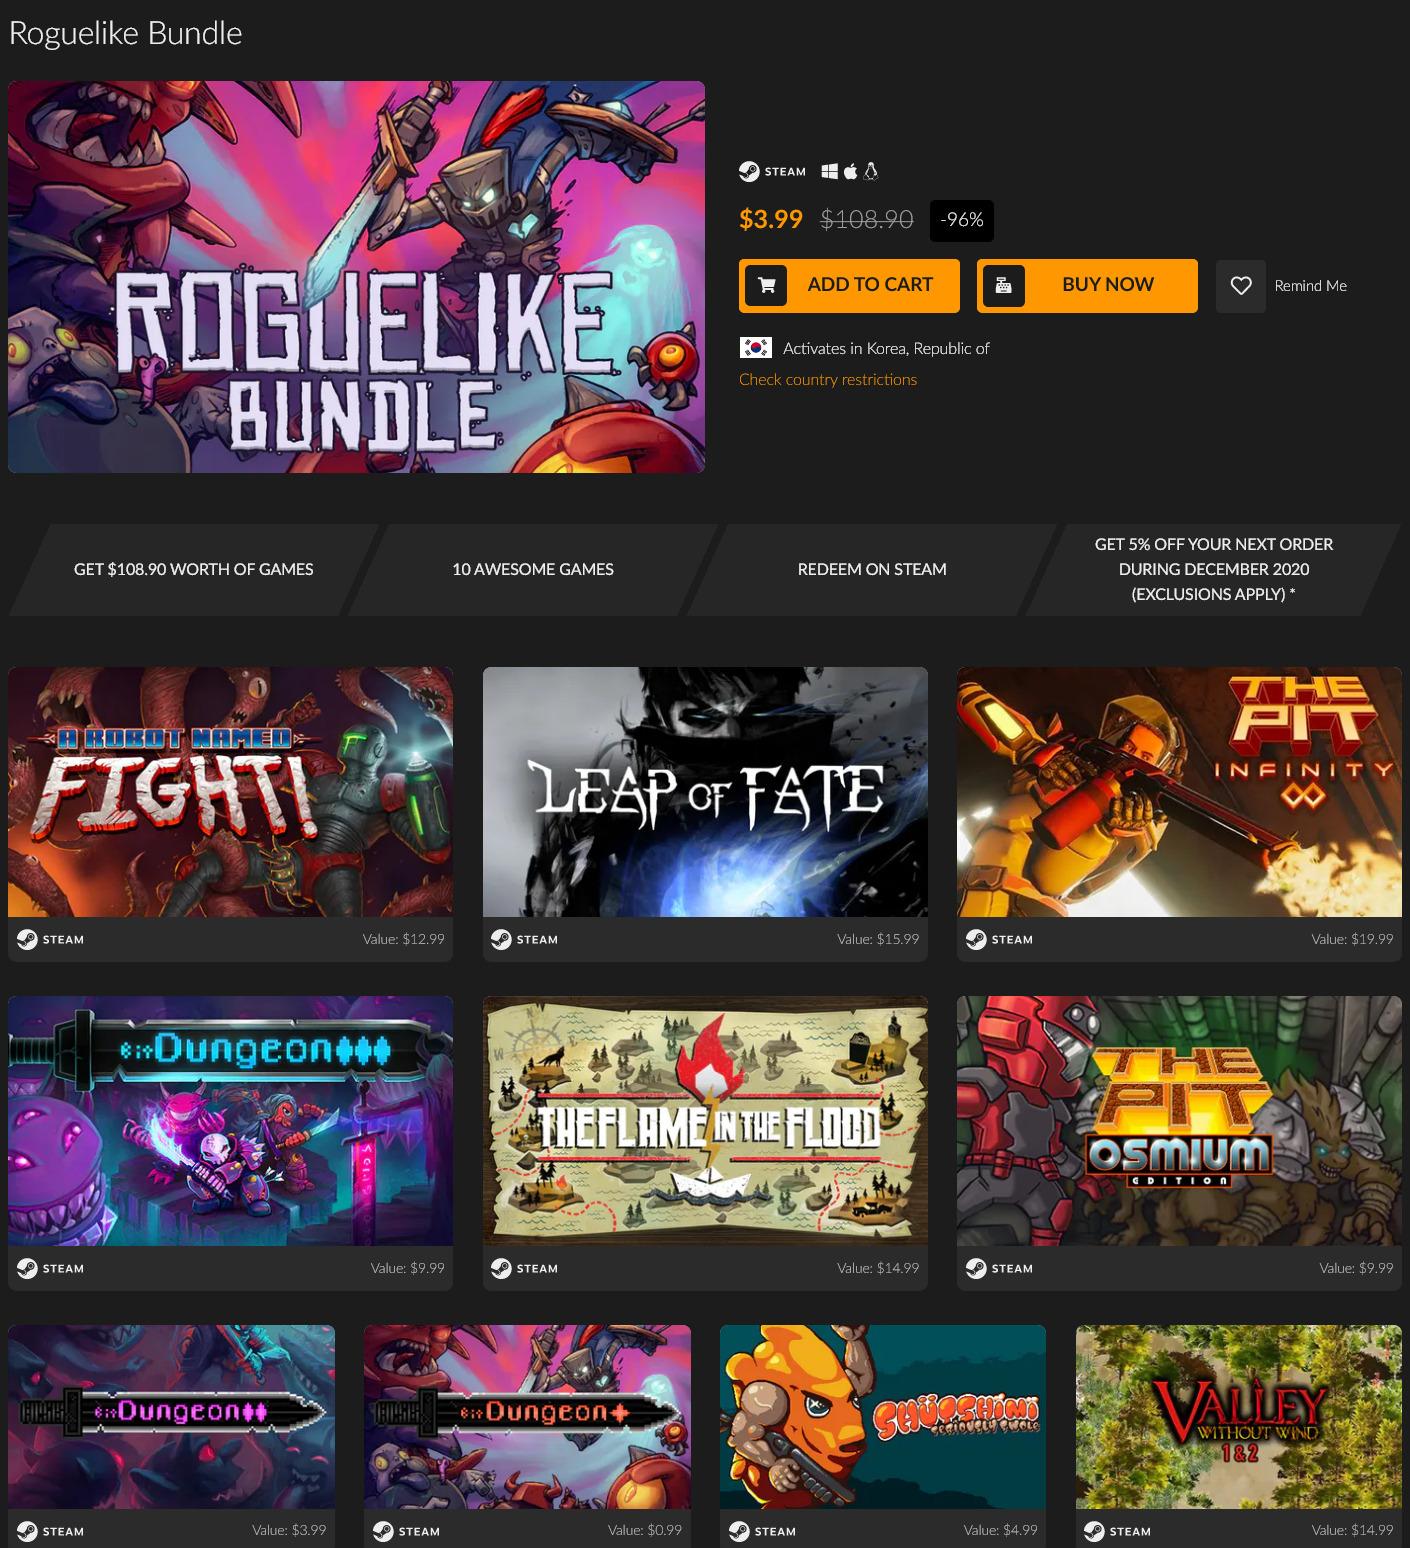 Screenshot_2020-11-26 Roguelike Bundle Steam Game Bundle Fanatical.jpg